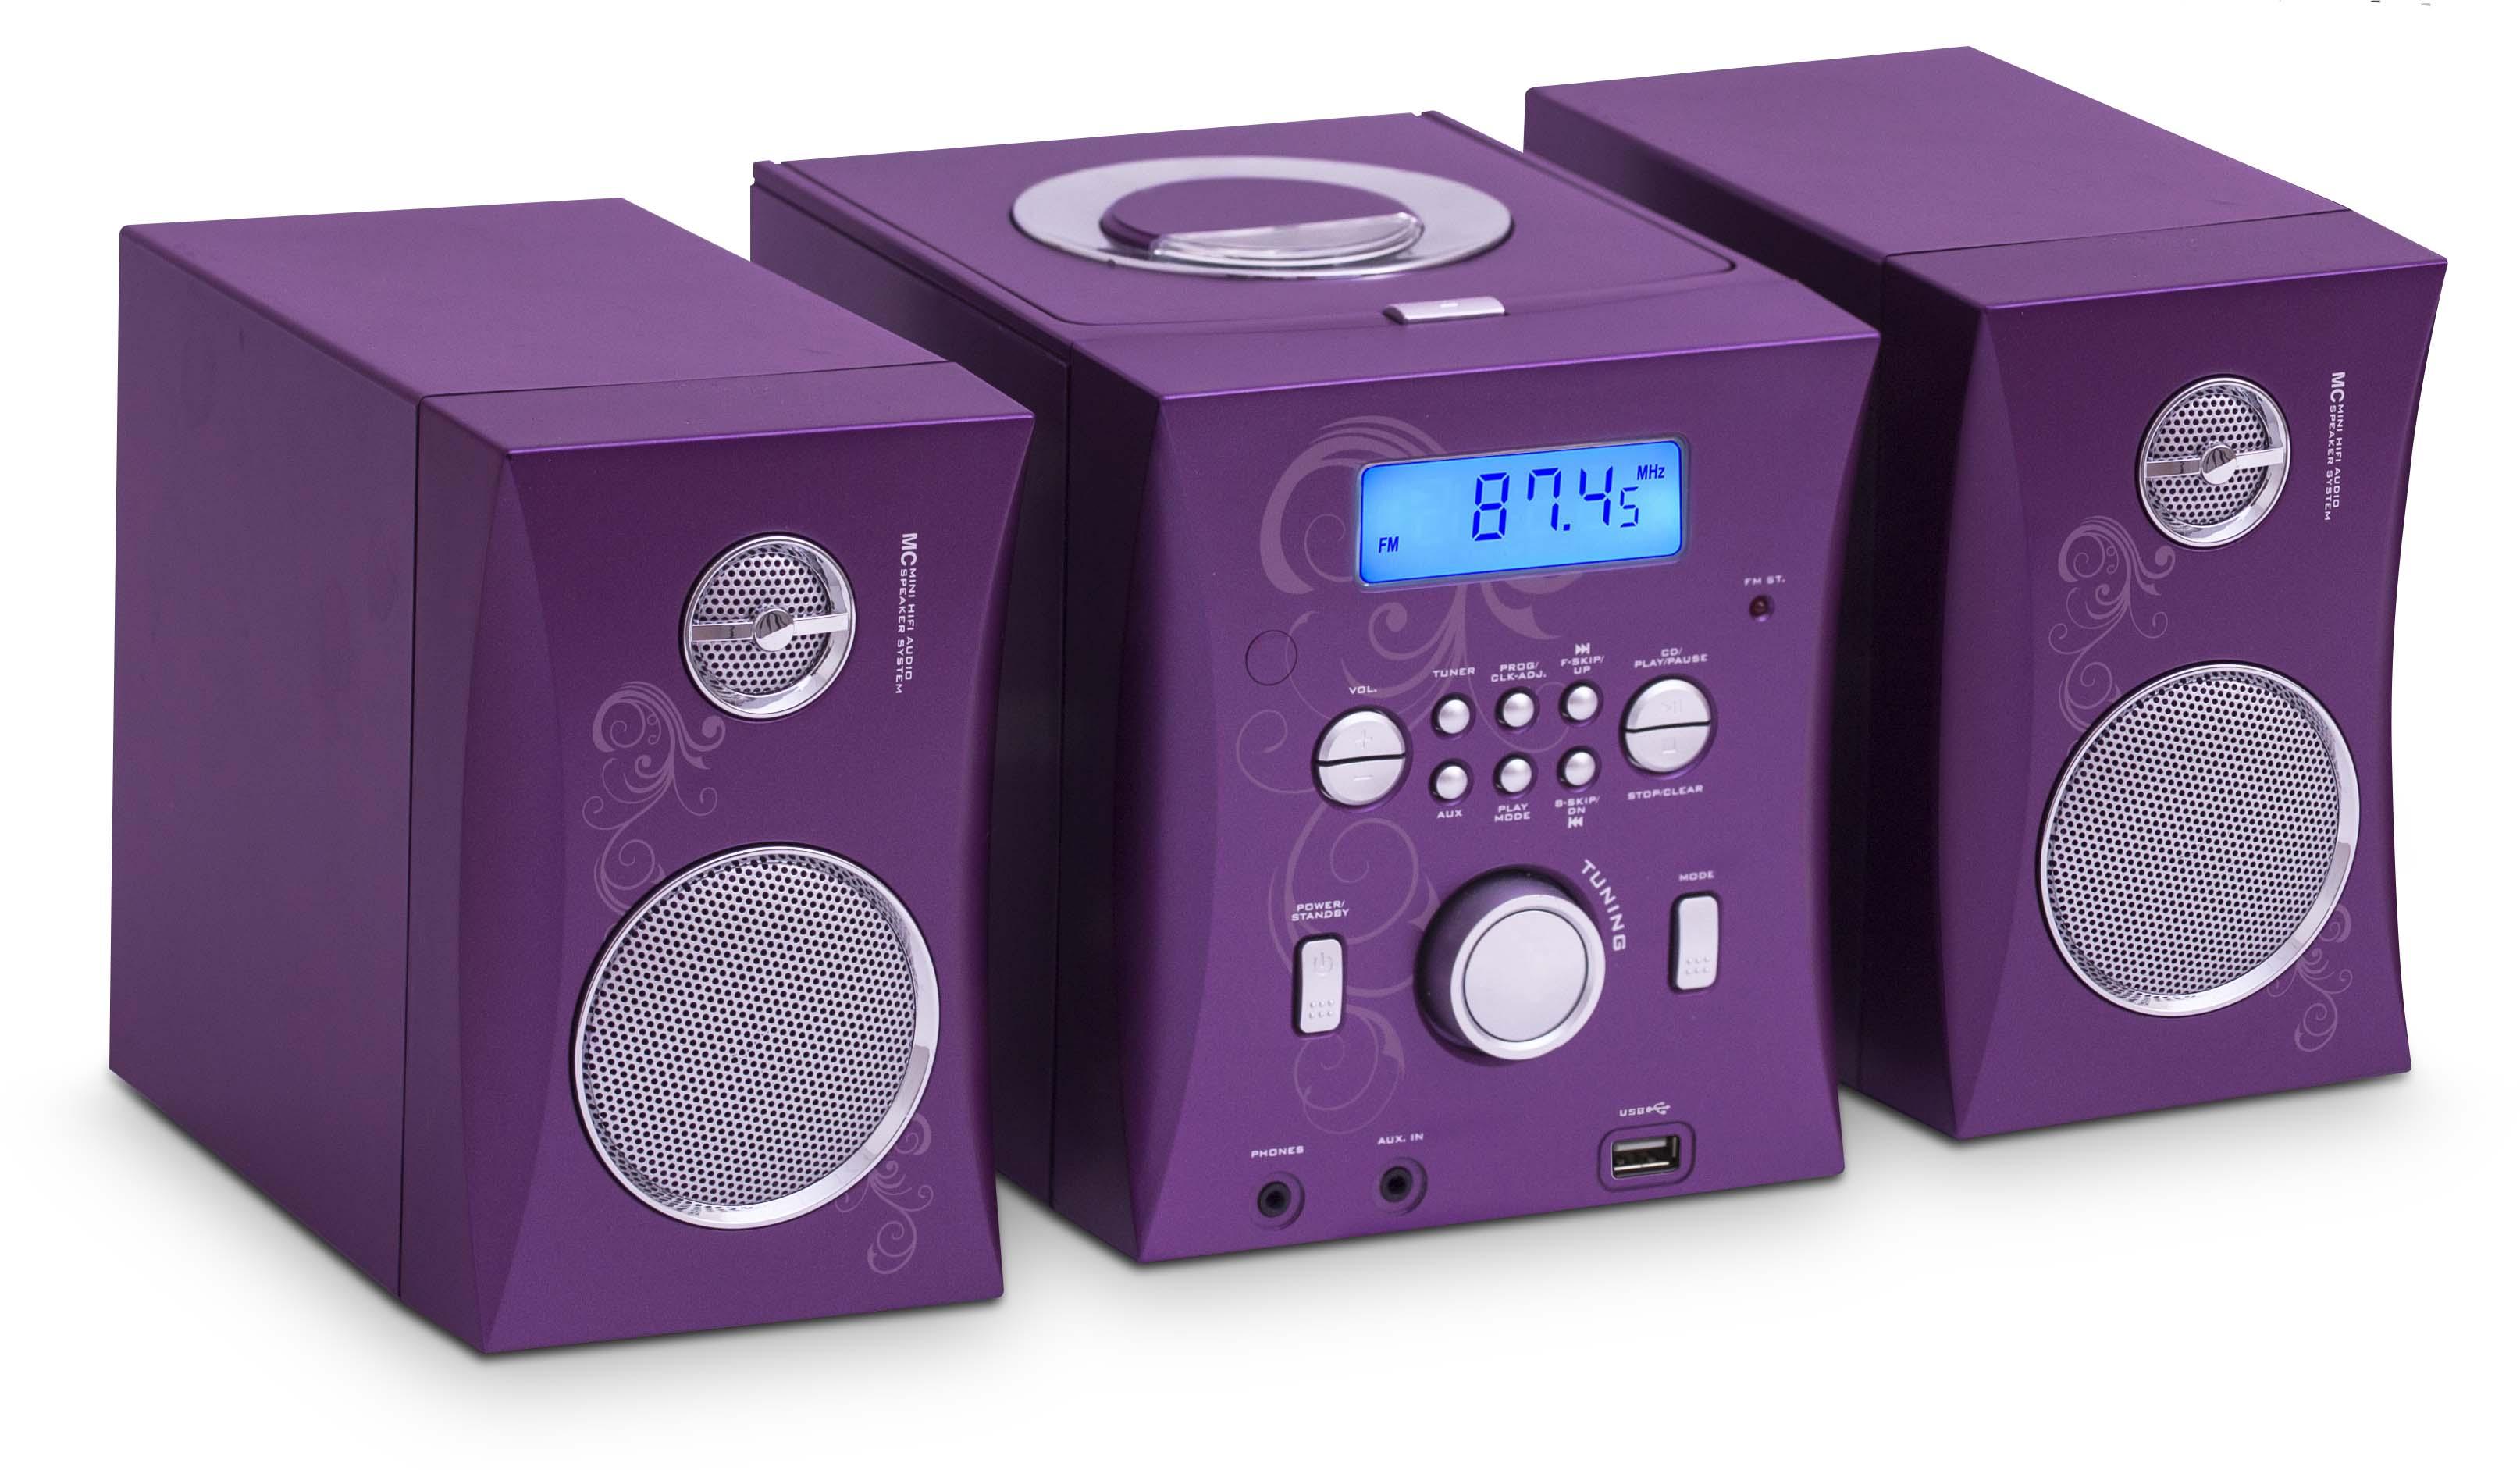 mp3 usb music center mcd06 arabesque bigben de bigben audio gaming smartphone. Black Bedroom Furniture Sets. Home Design Ideas